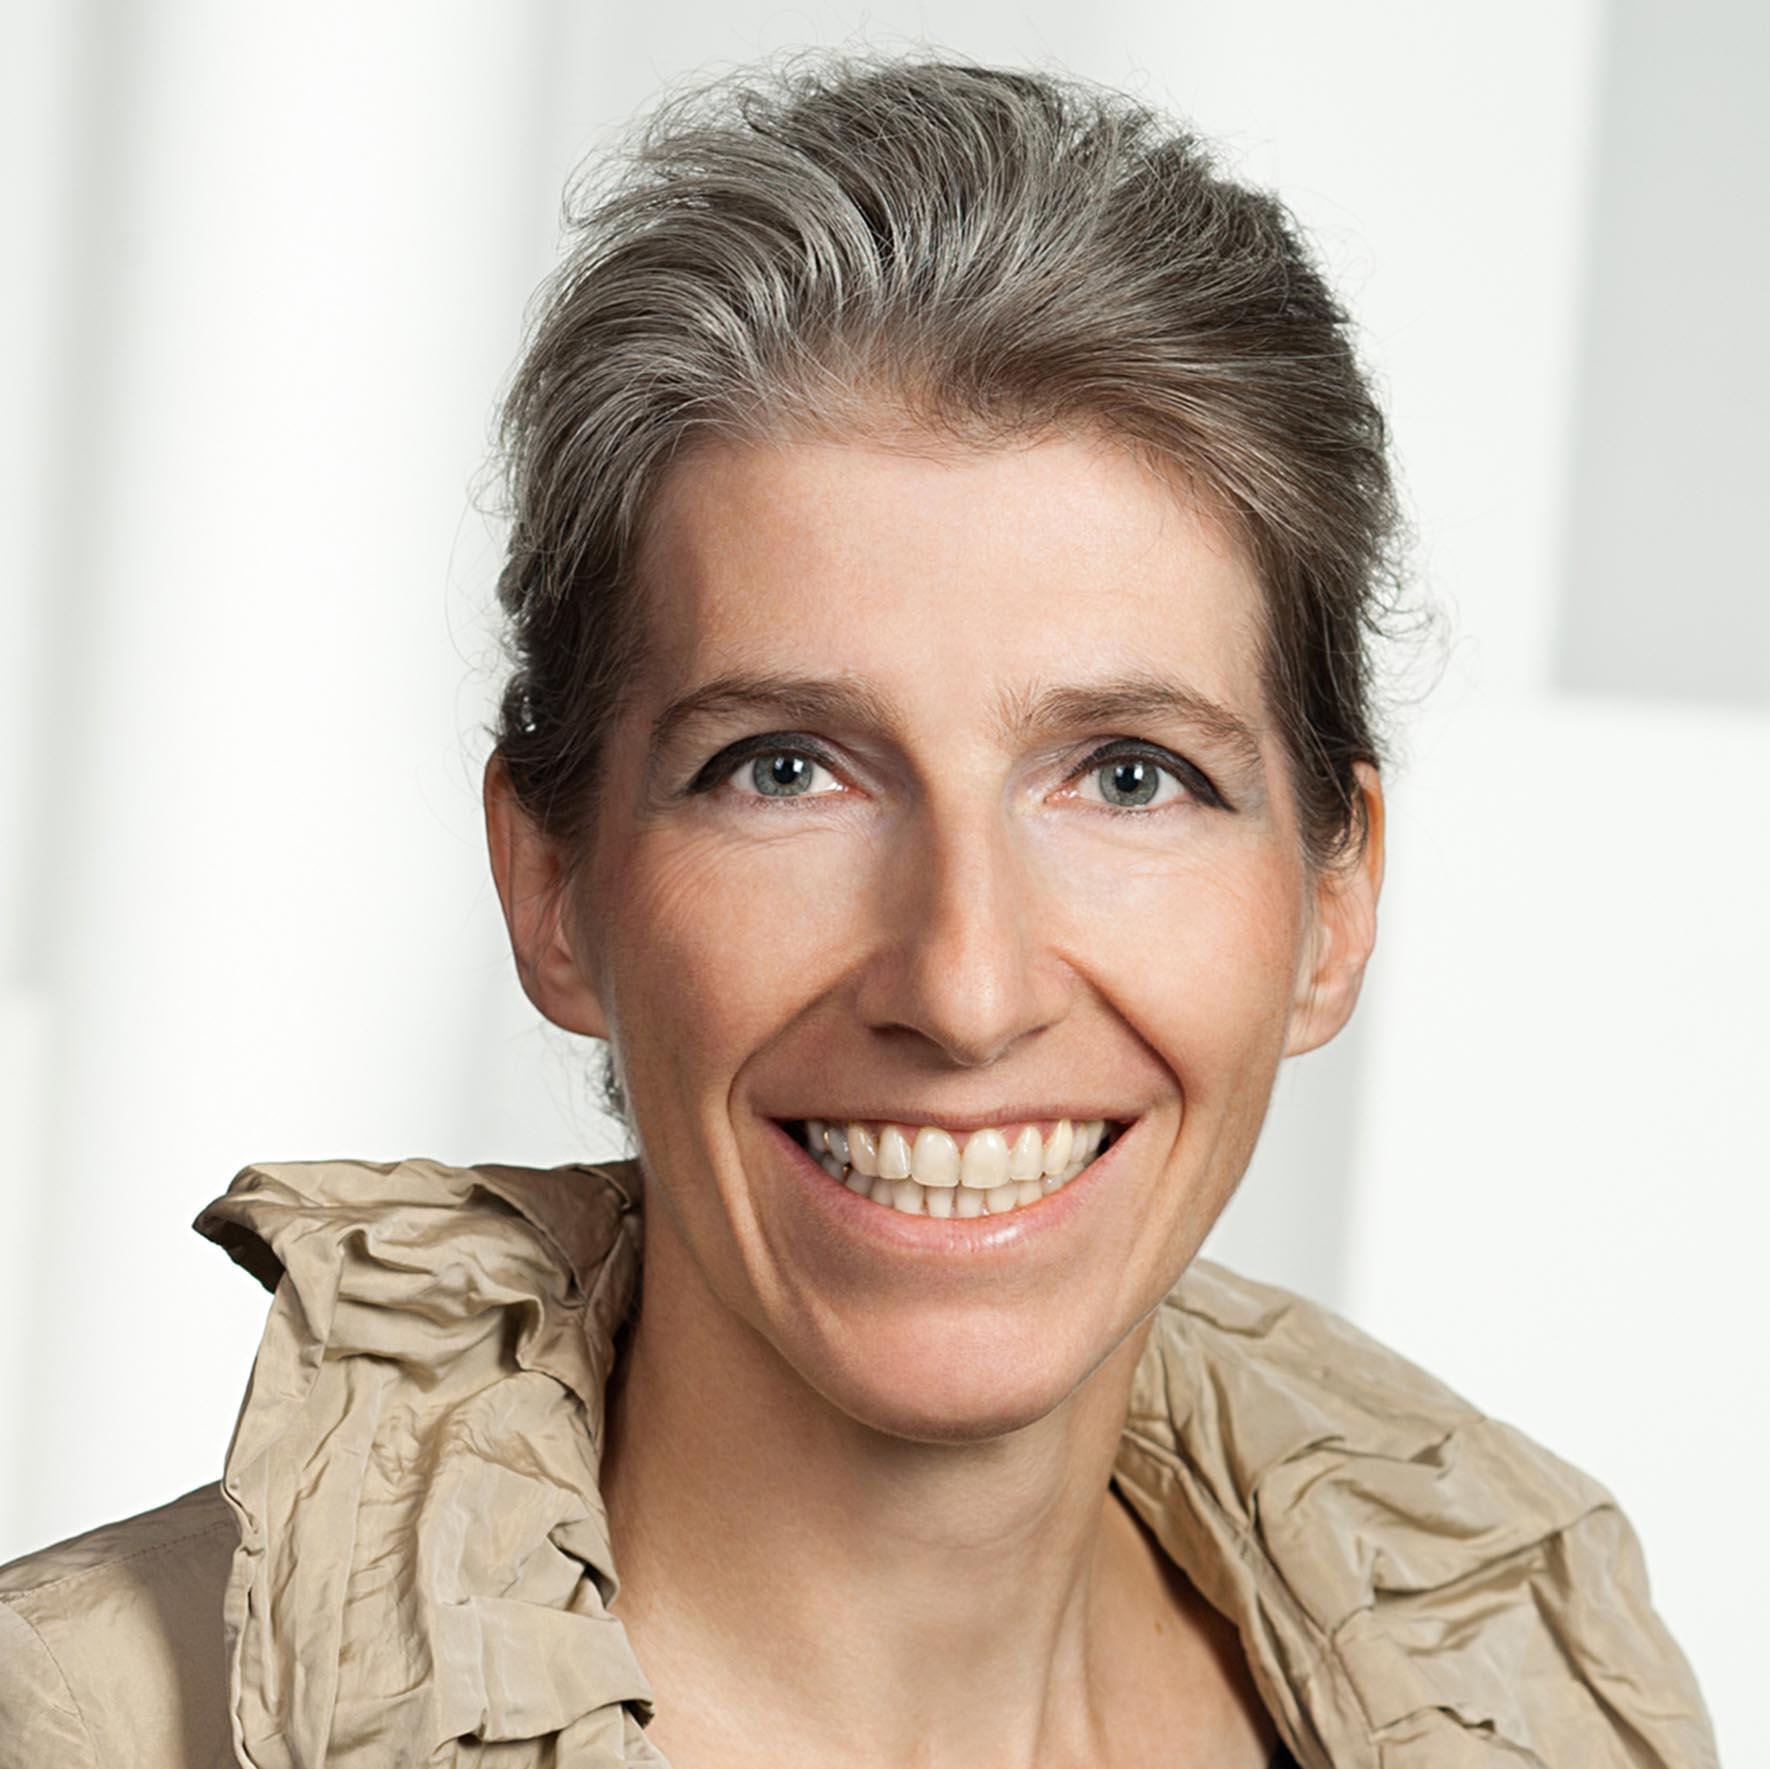 Univ.-Prof. Dr. Christiane Wendehorst